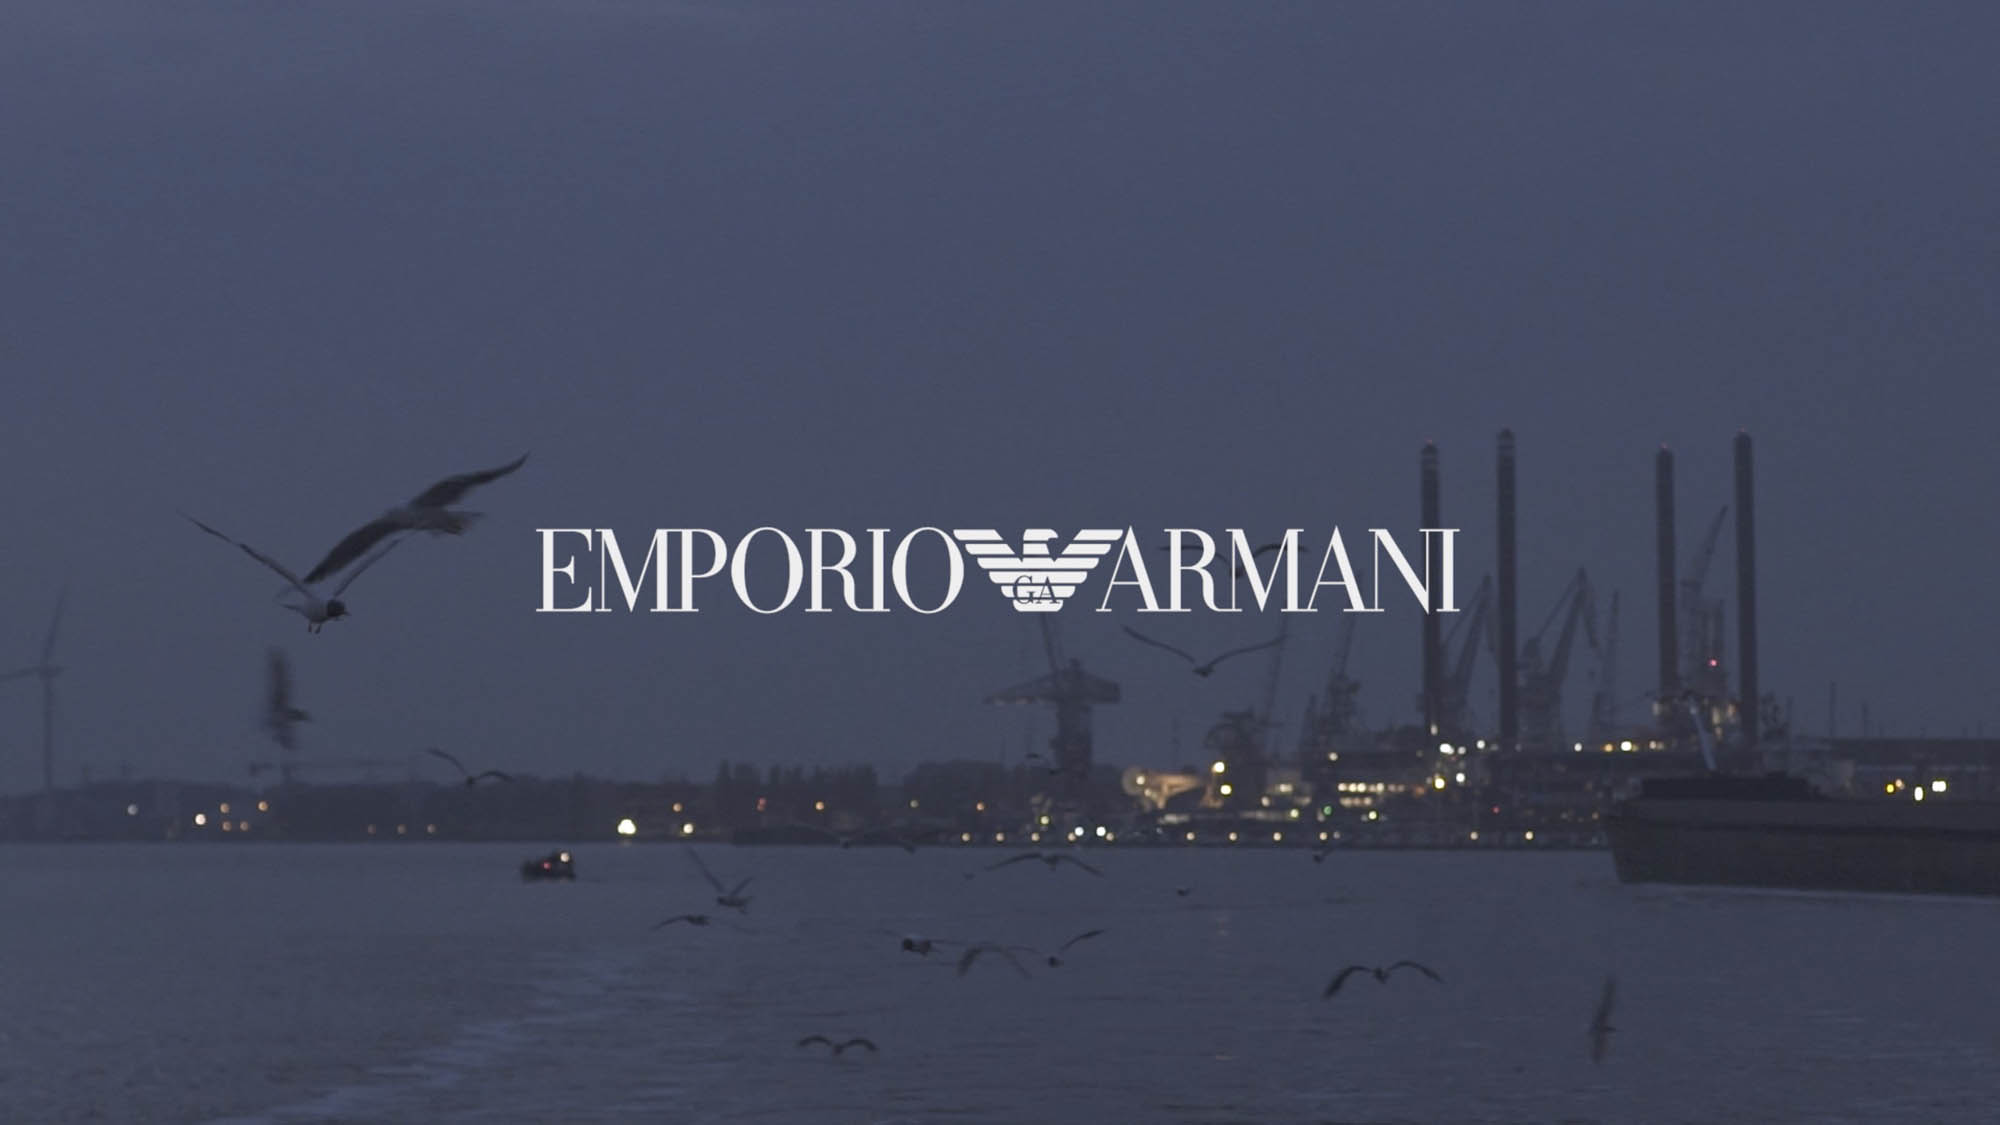 emporioarmani-zepstudio-015